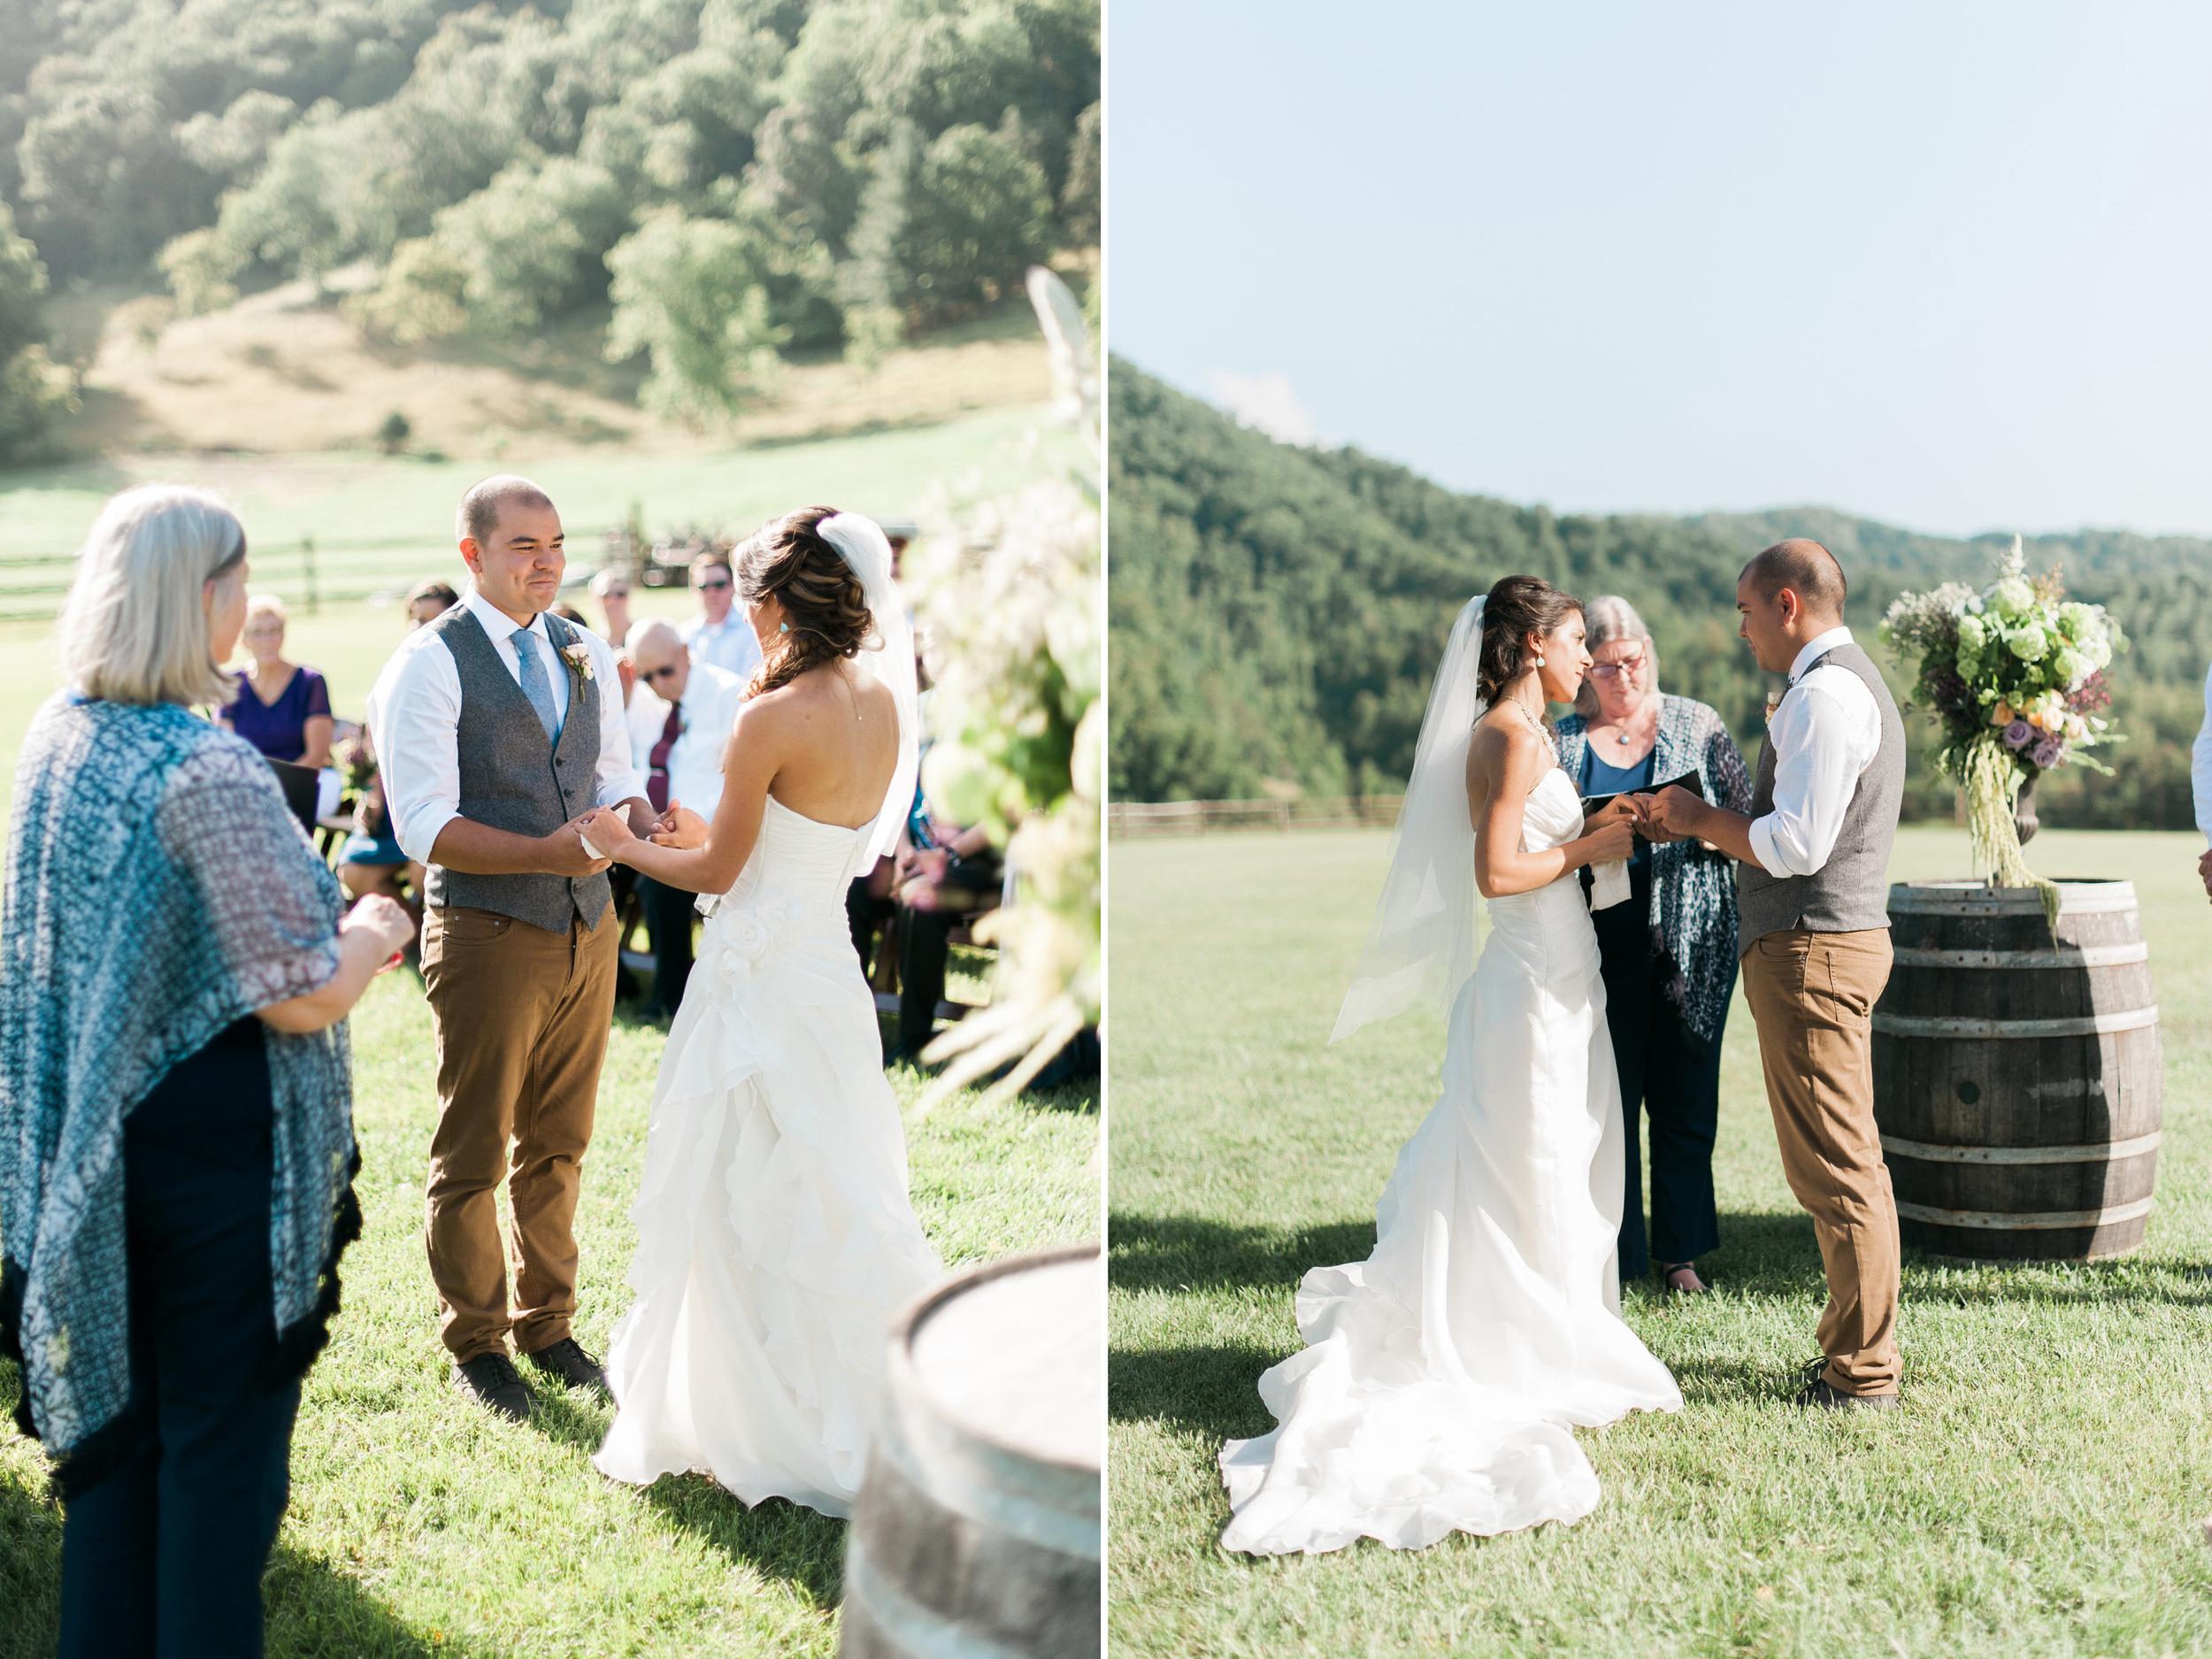 Cait and Javier Wedding-31.jpg